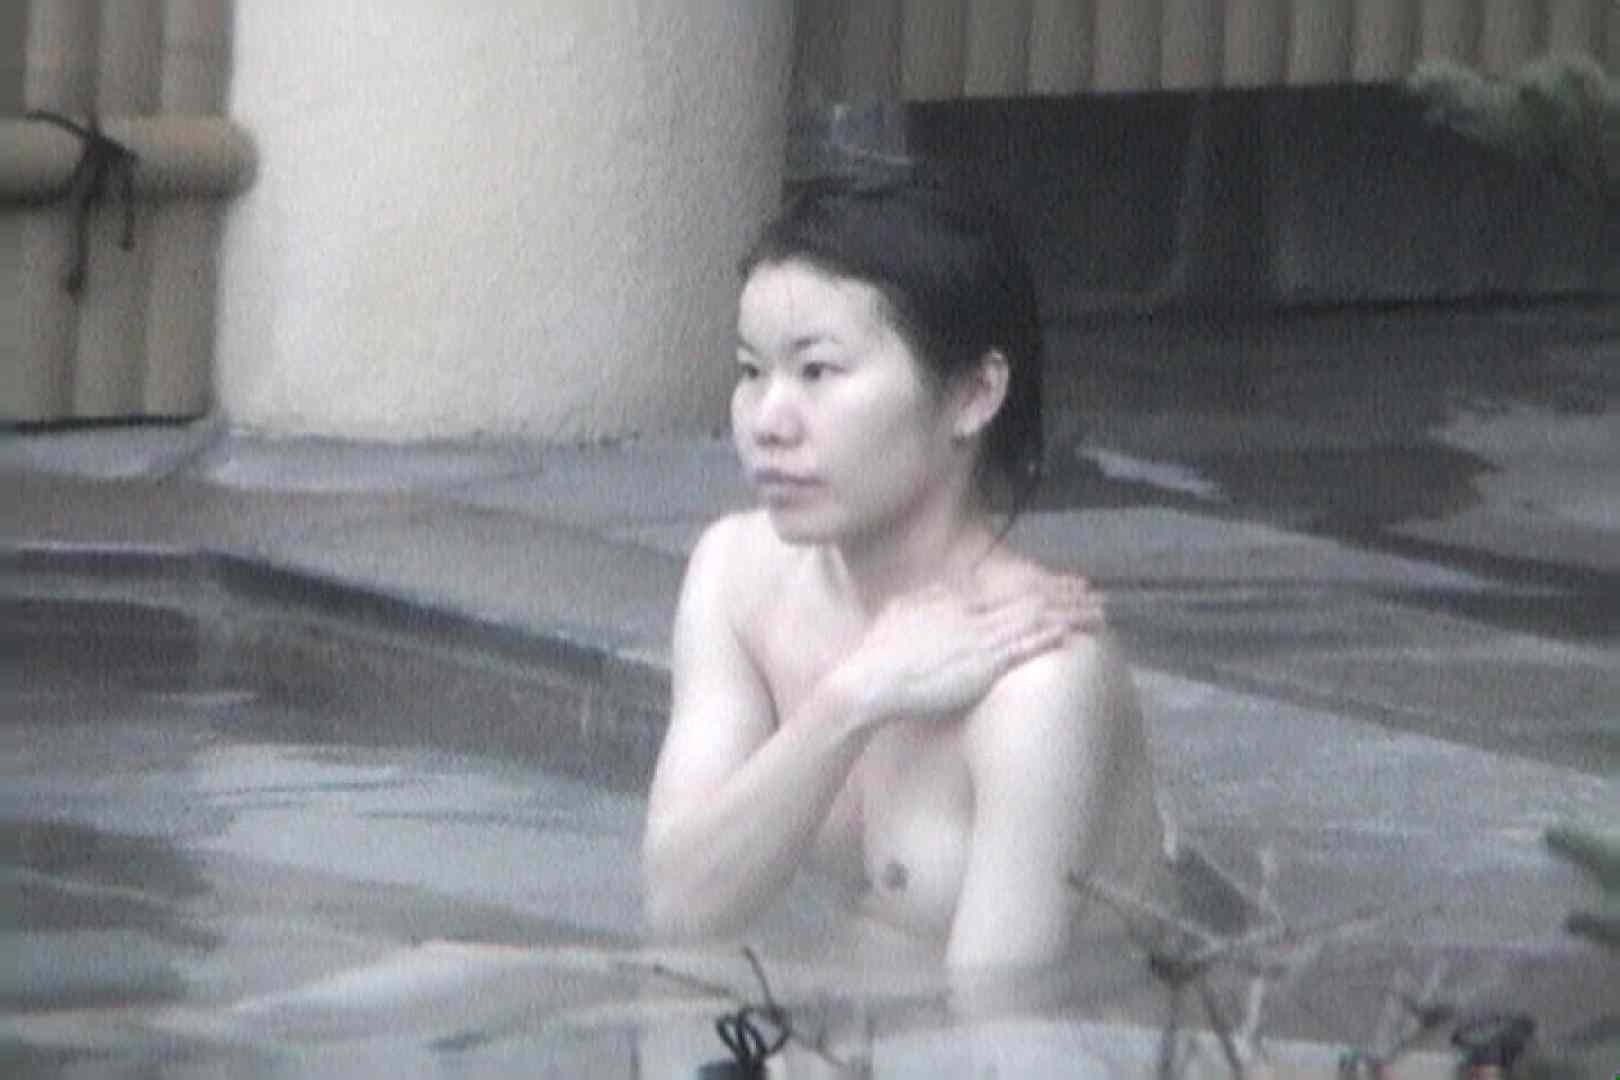 Aquaな露天風呂Vol.556 露天風呂編 | 盗撮シリーズ  99PIX 41